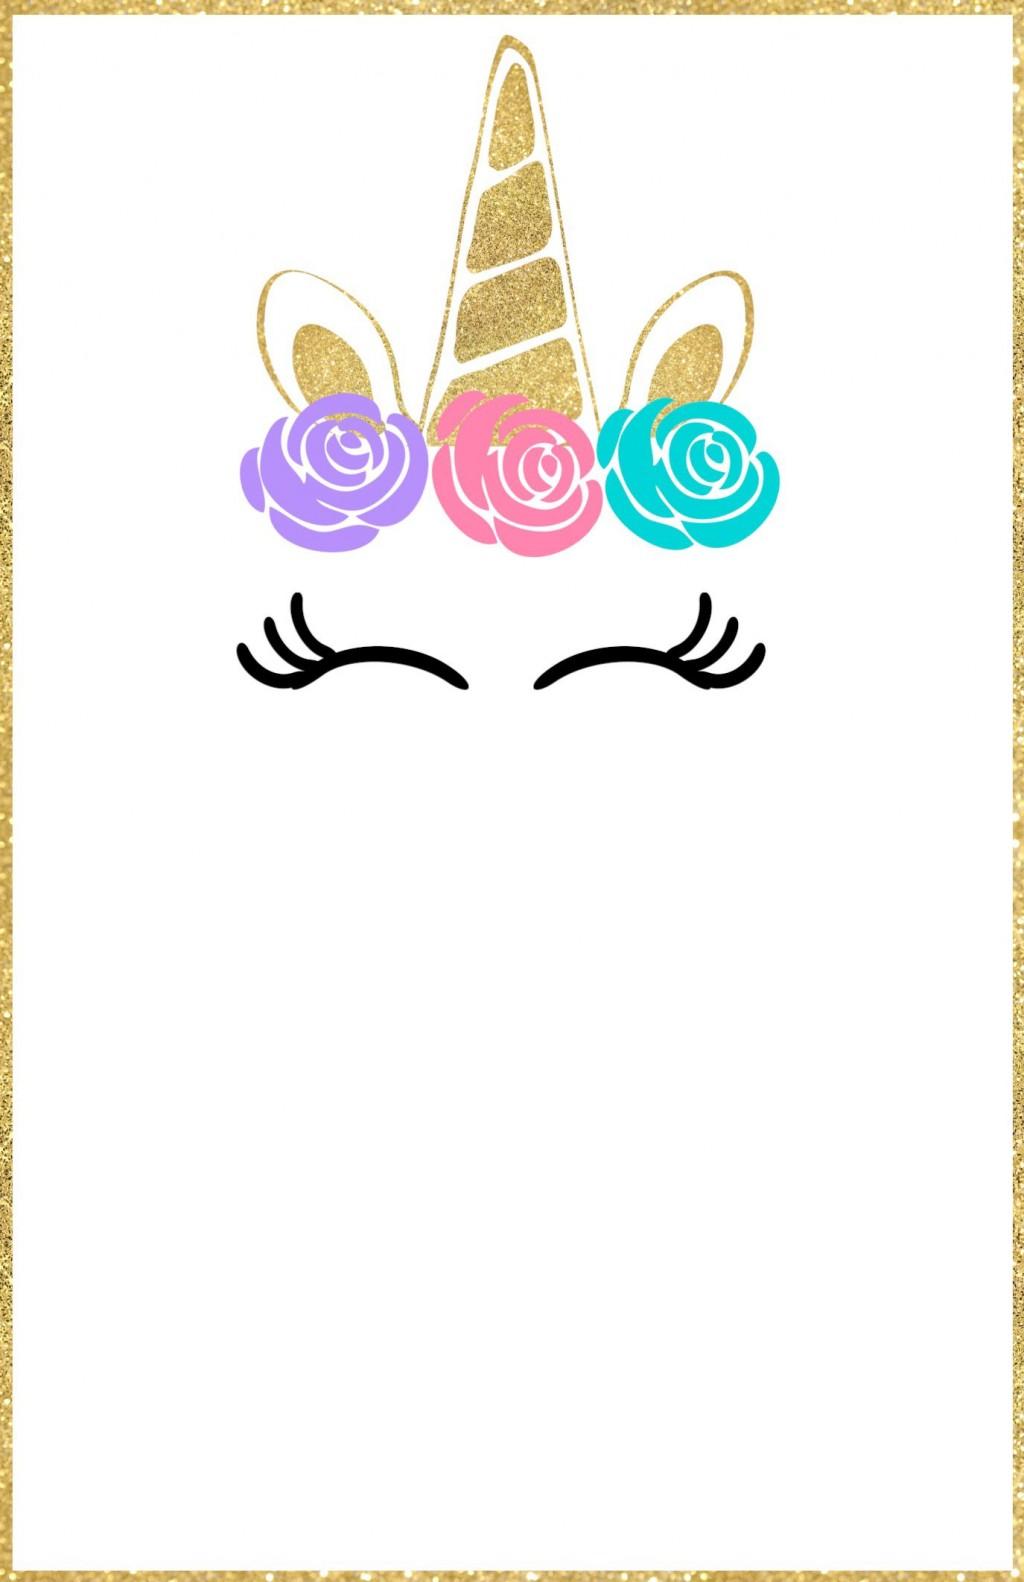 011 Fearsome Unicorn Baby Shower Template Free Download Idea  Printable InvitationLarge